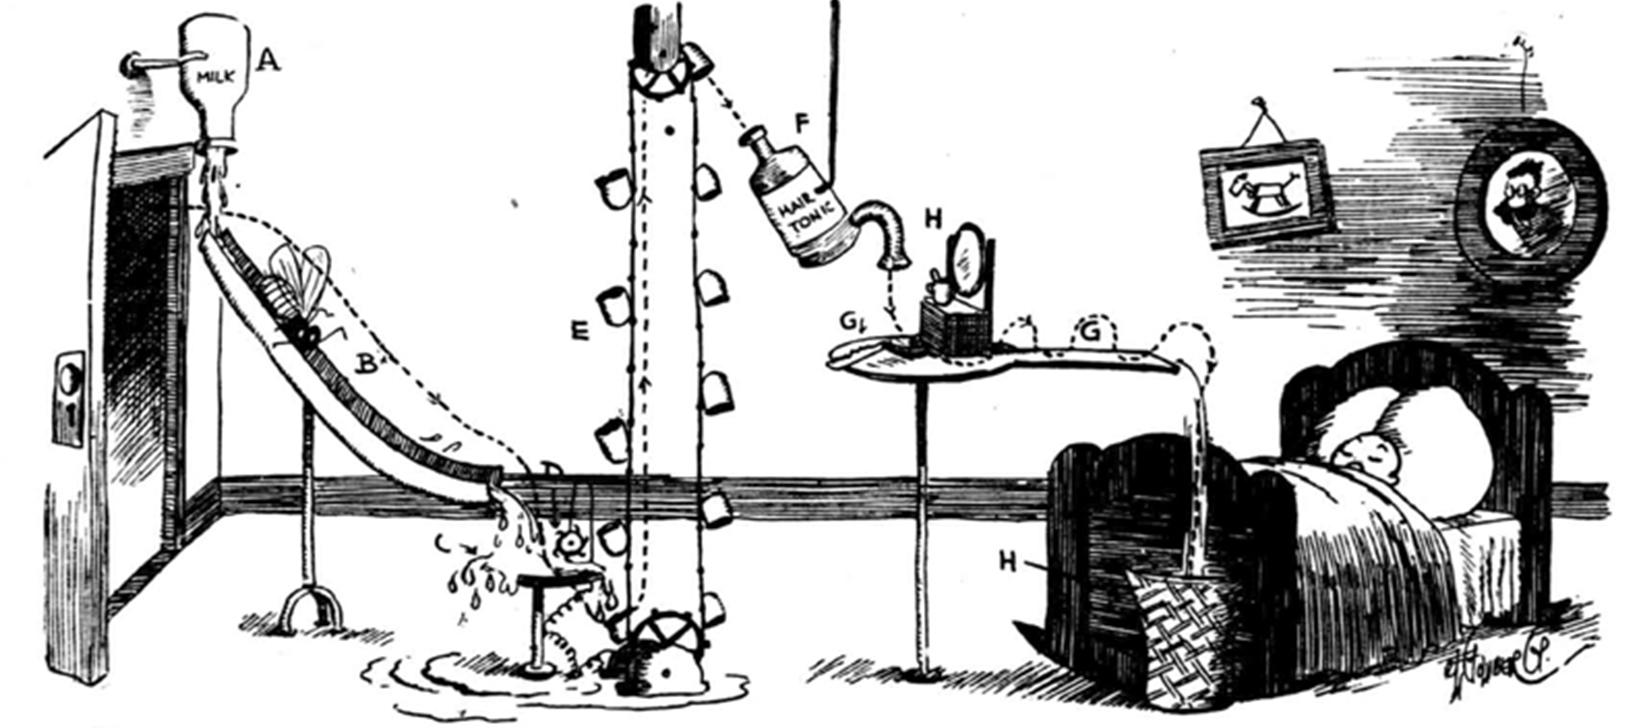 A cartoon of an original Goldberg machine.